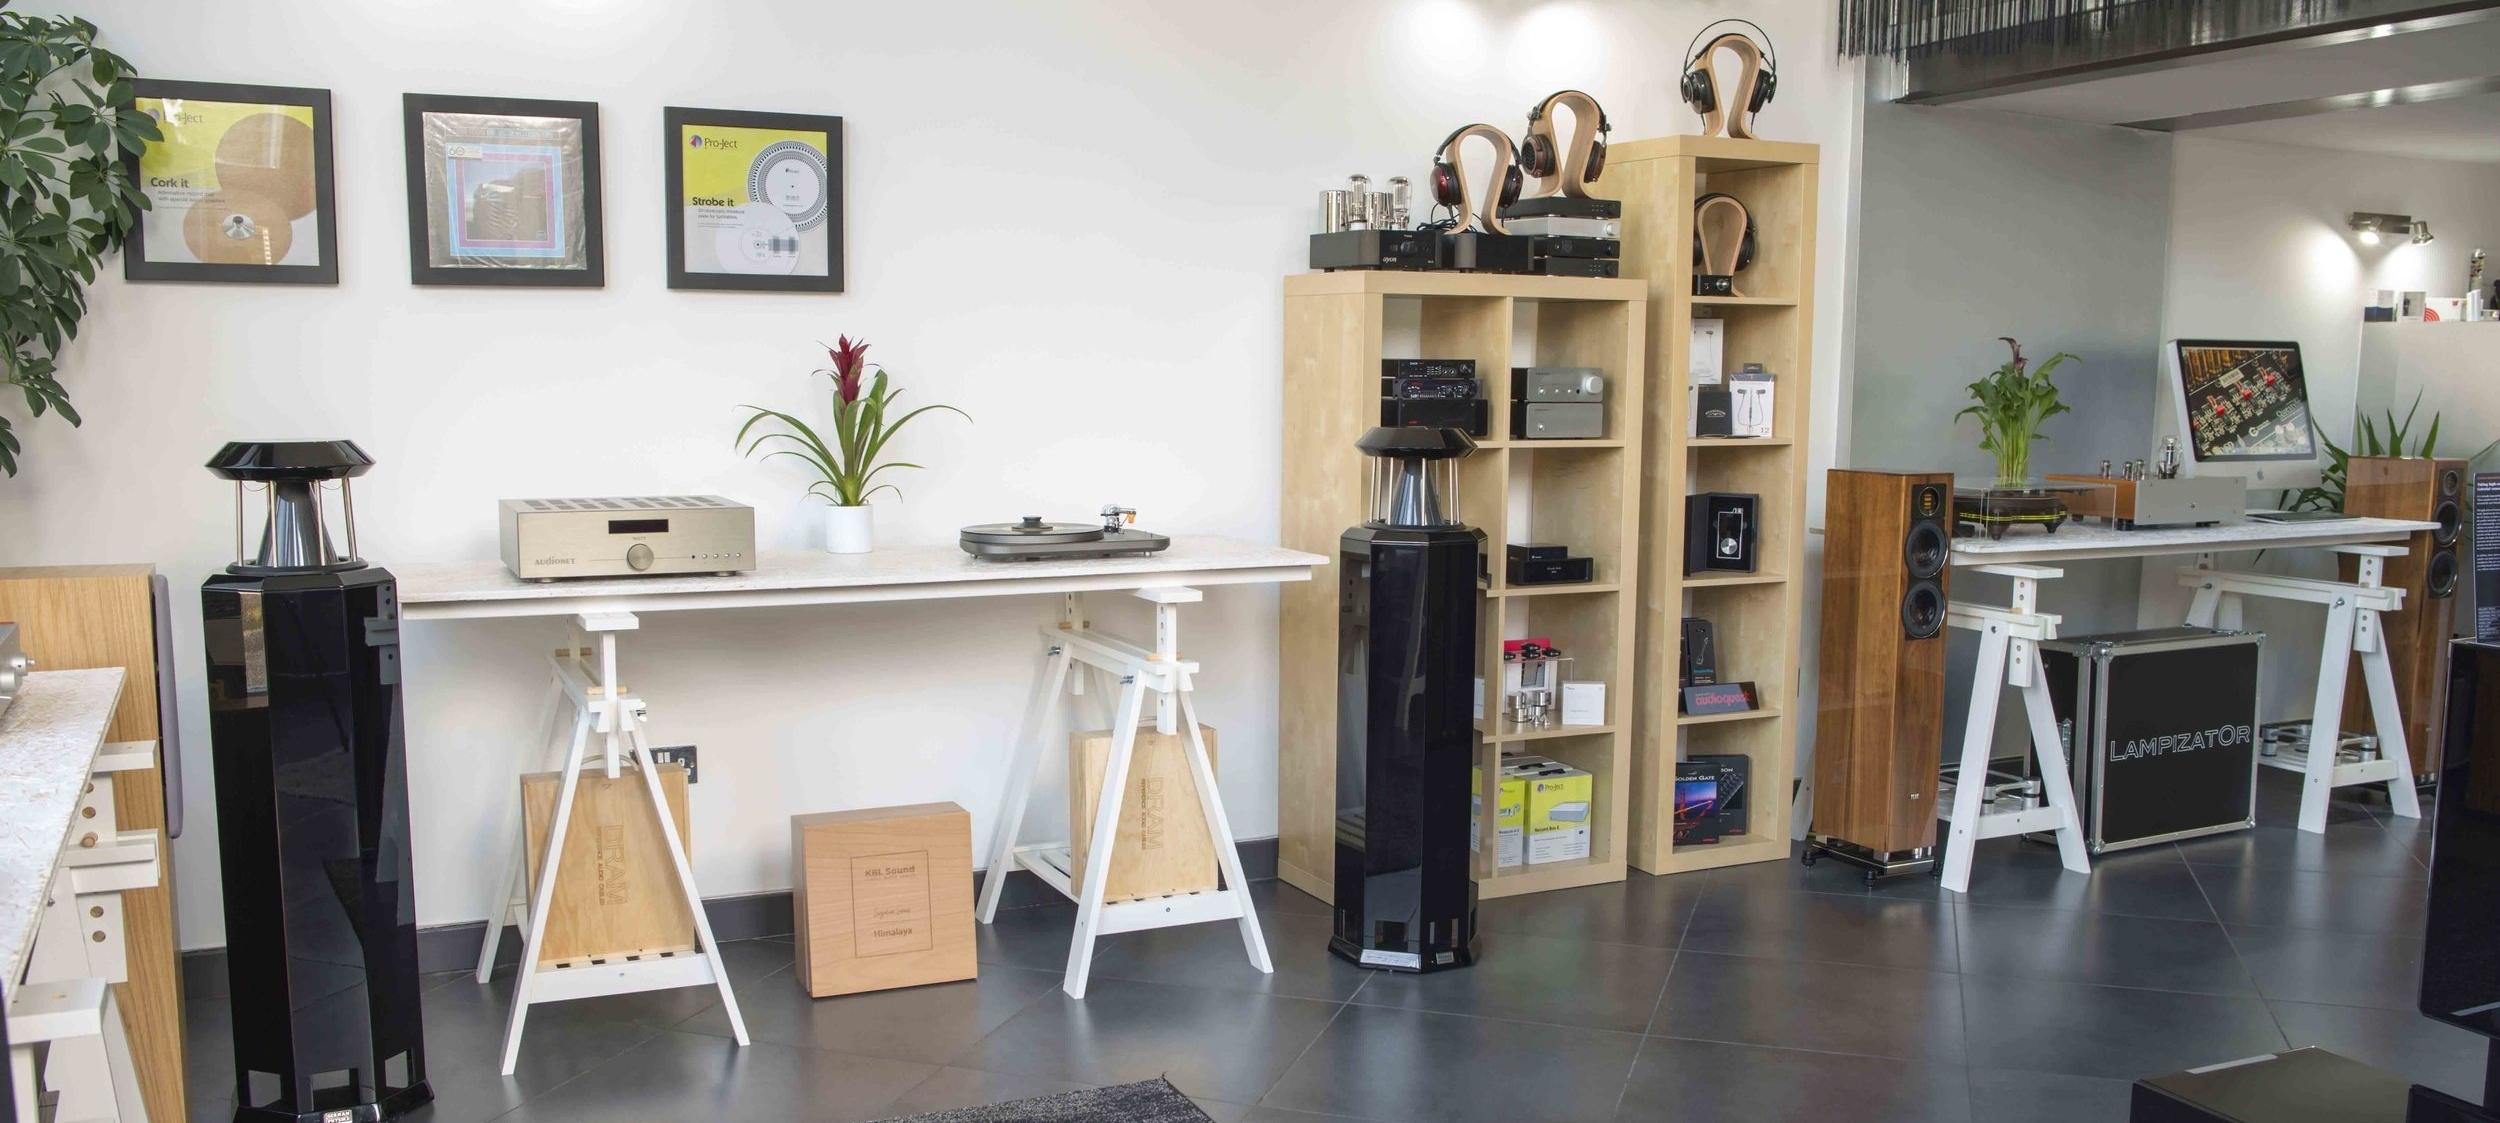 audio-philia-hifi-shop-scotland